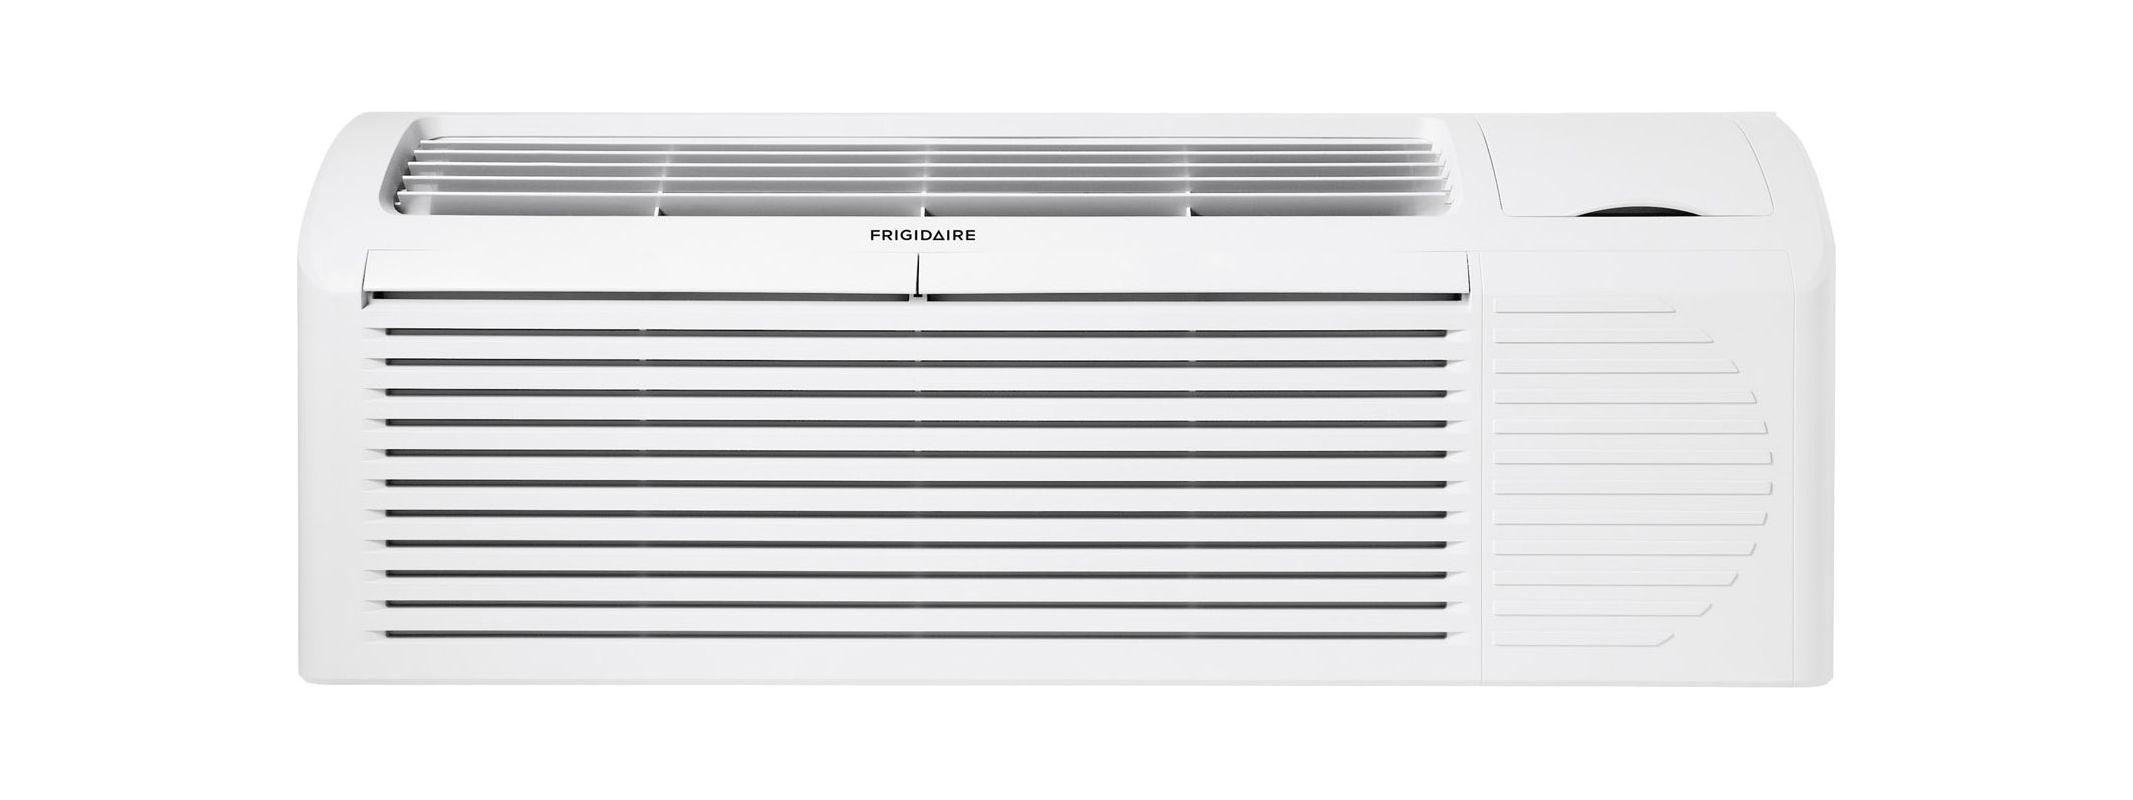 Frigidaire FRP90ETT3R 9,000 BTU 265 Volt Packaged Terminal Air Conditioner (PTAC photo